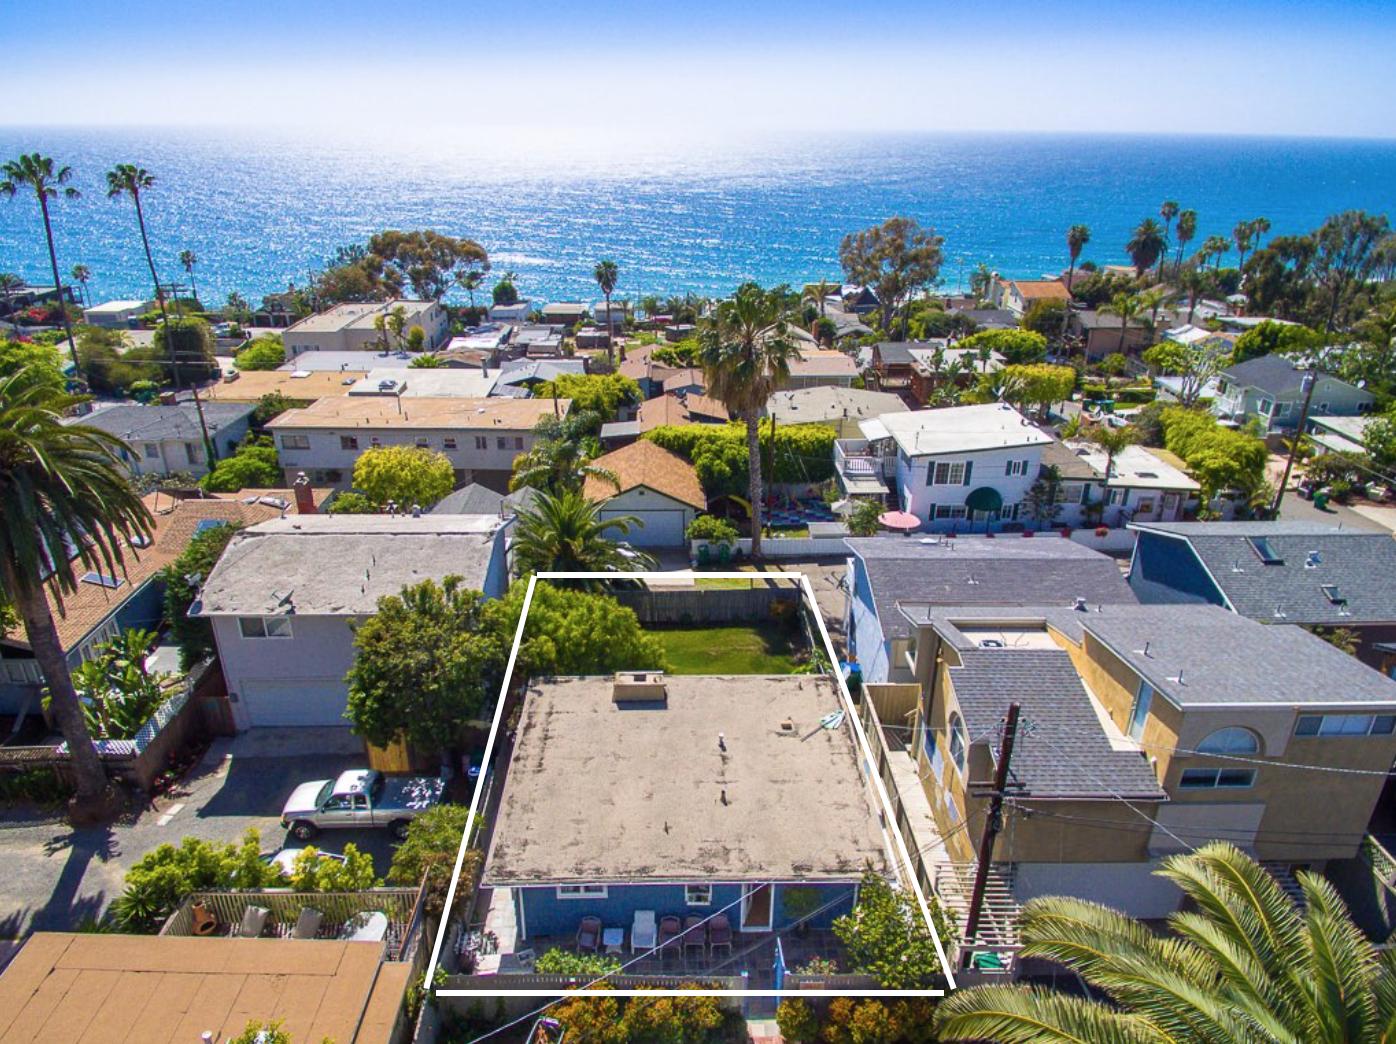 Villa per Vendita alle ore 31865 Seaview Street Laguna Beach, California, 92651 Stati Uniti